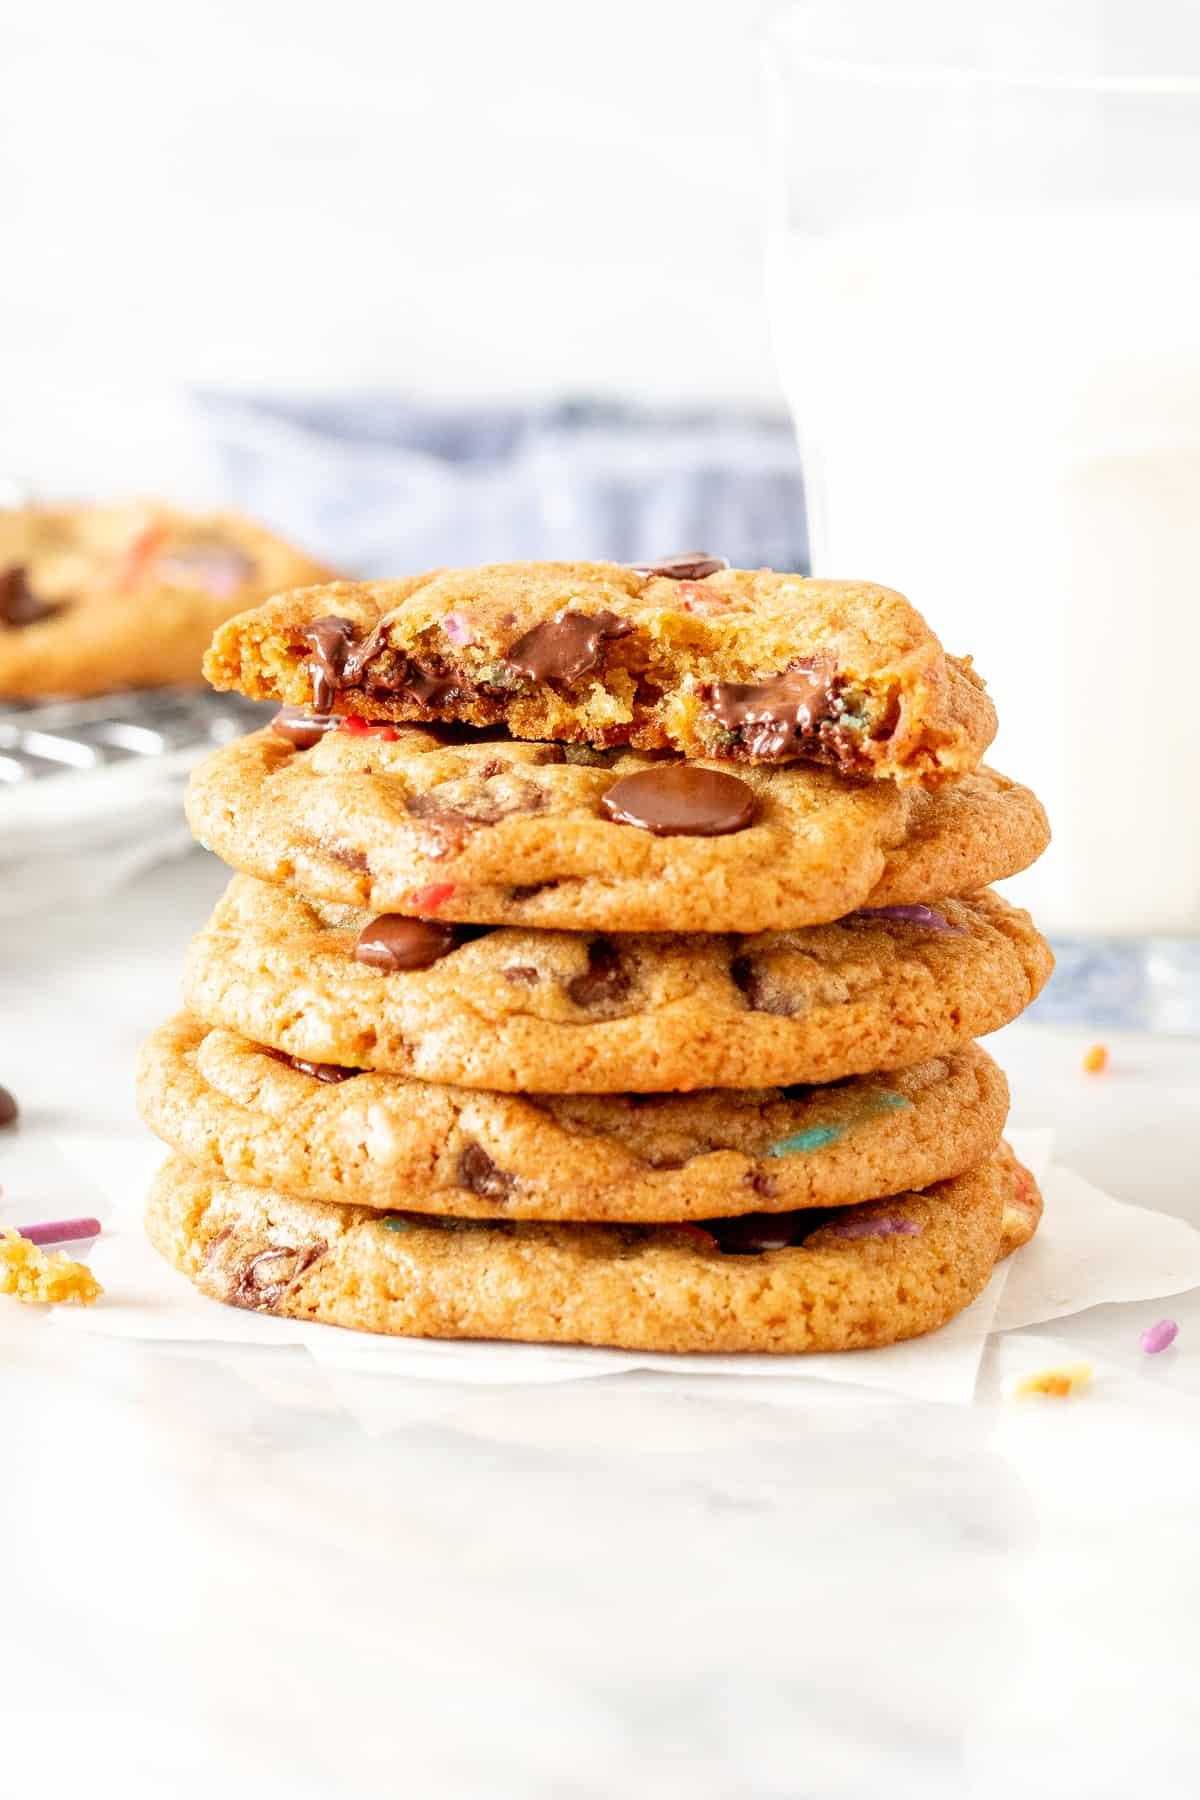 Stack of birthday chocolate chip cookies, with top cookie broken in half